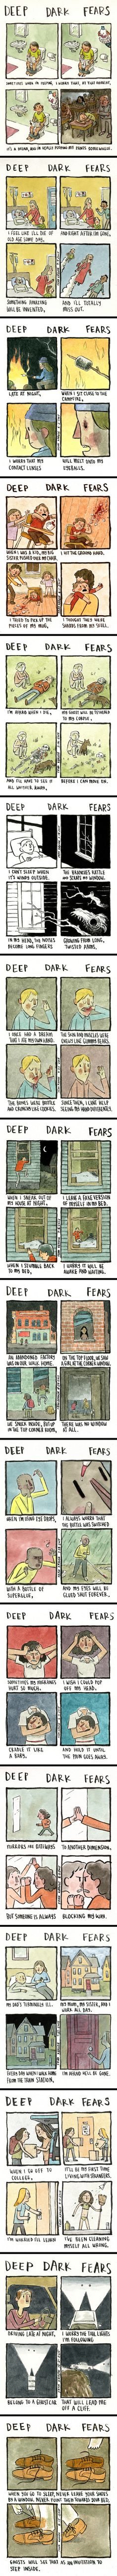 16 Deep Dark Fears Can Never Be So True Describing Your Greatest Nightmares (Part 2)